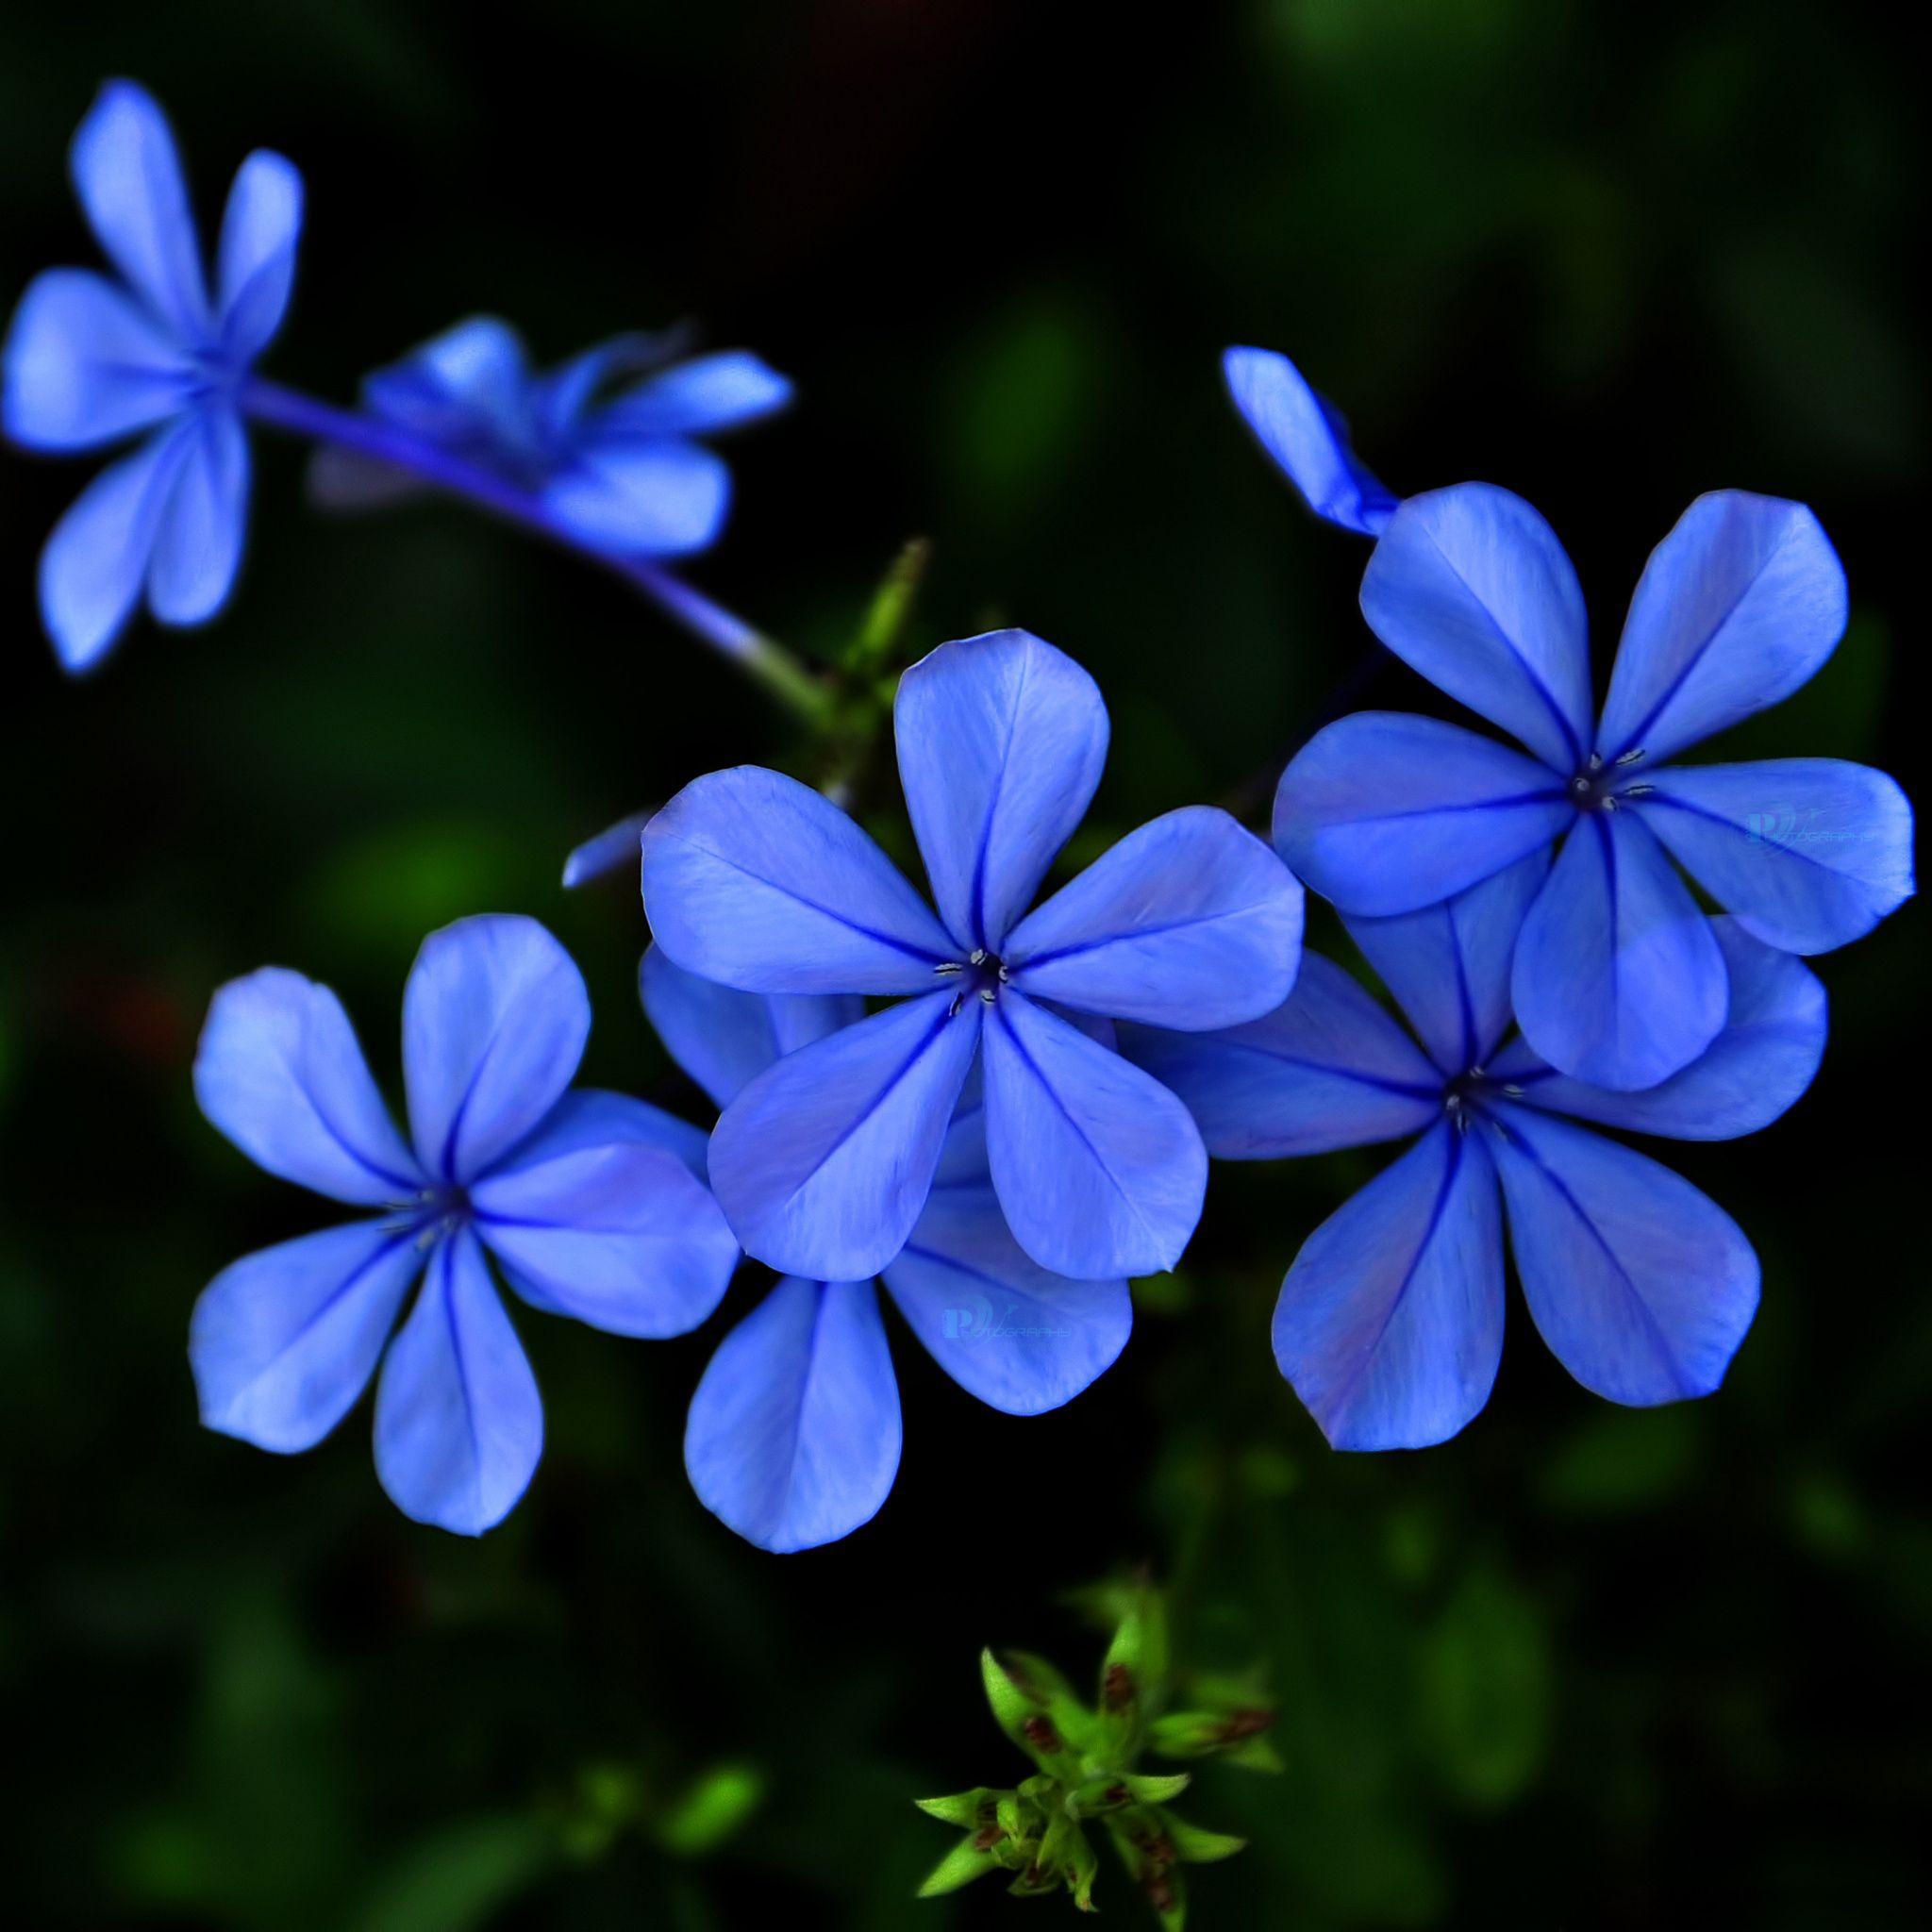 Blue Flowers Ipad Wallpaper Hd